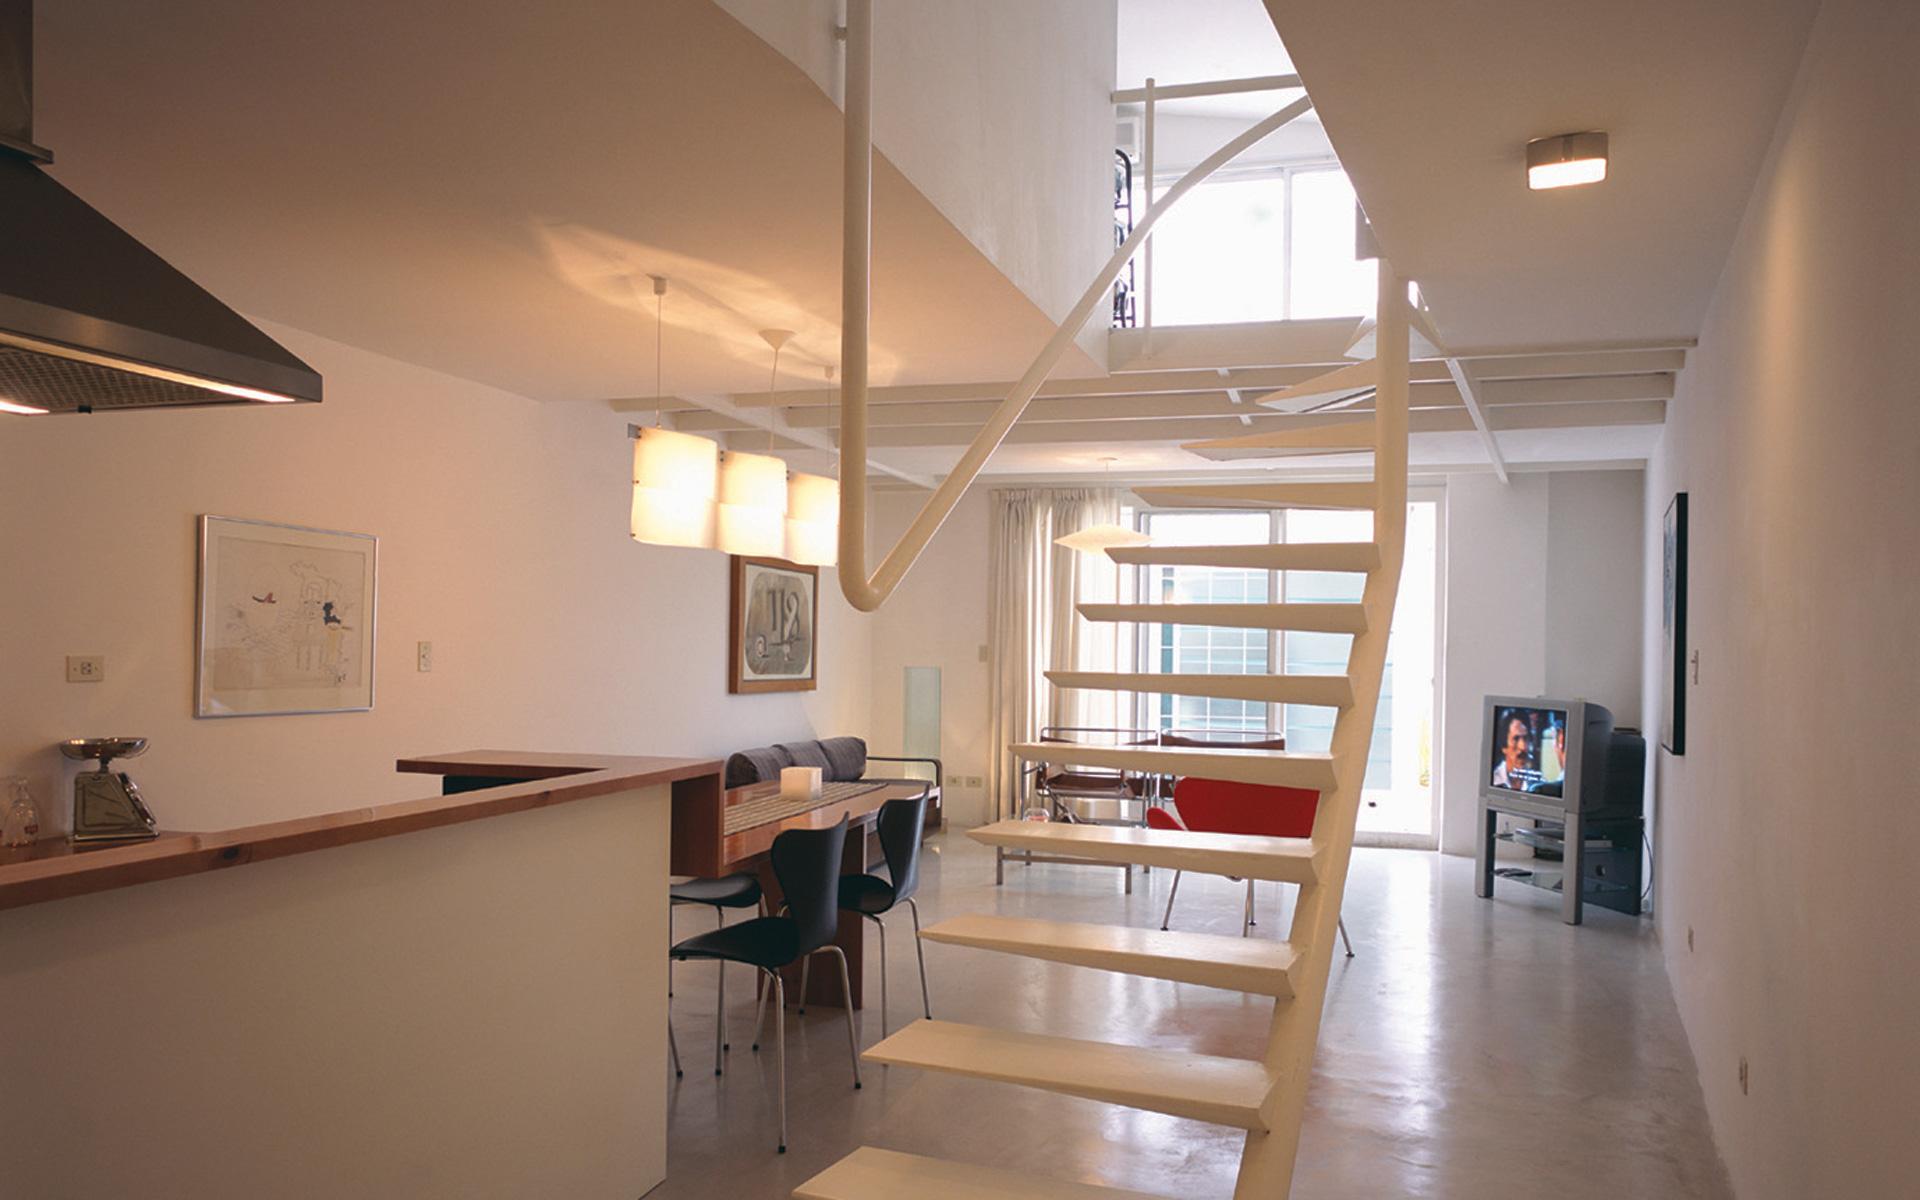 Architecture And Design Studio Noa Najmias Office For Architecture # Muebles Capital Federal